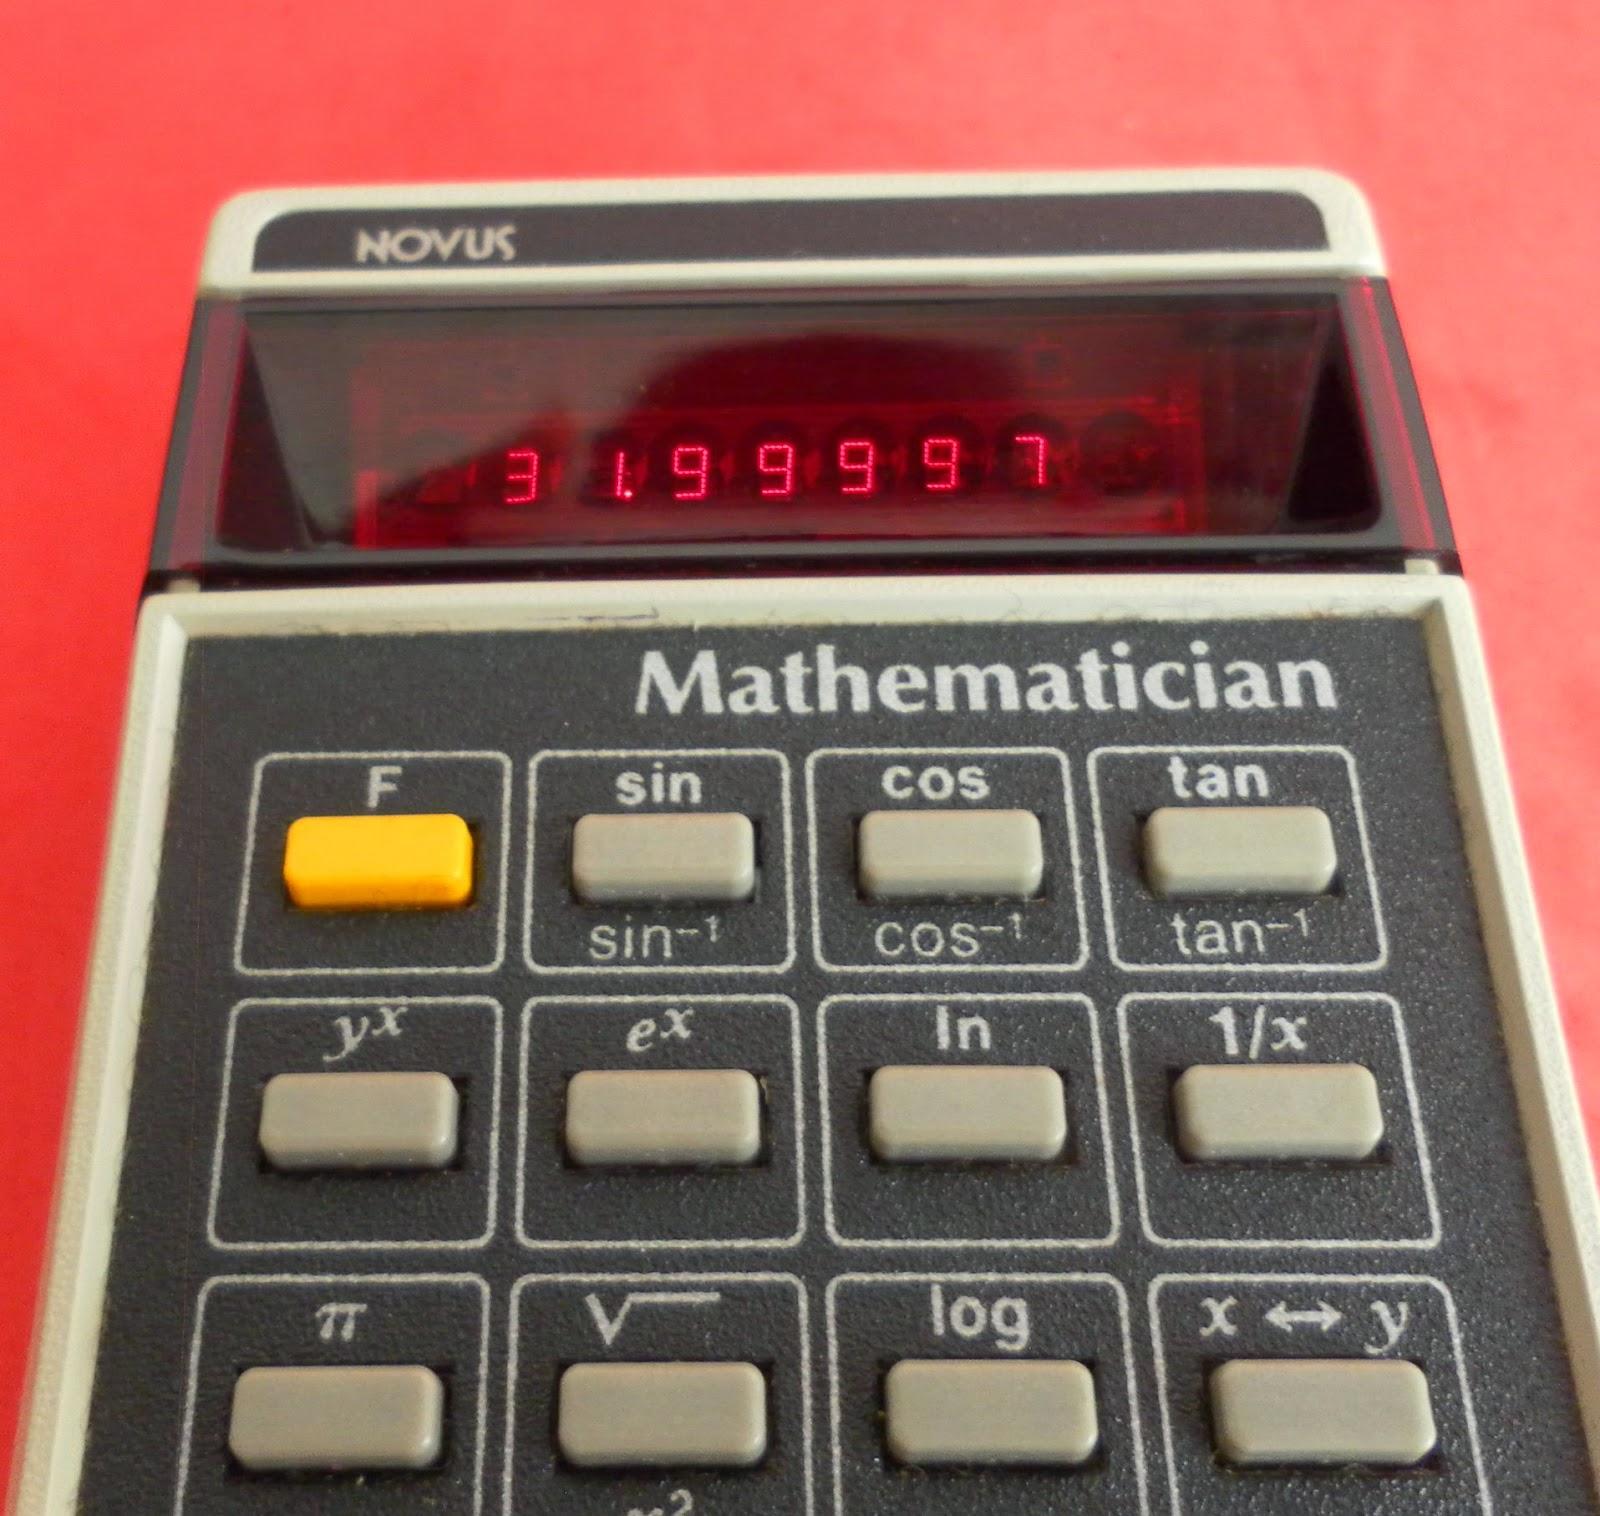 [Image: NS_Novus-4510_Mathematician_016.jpg]